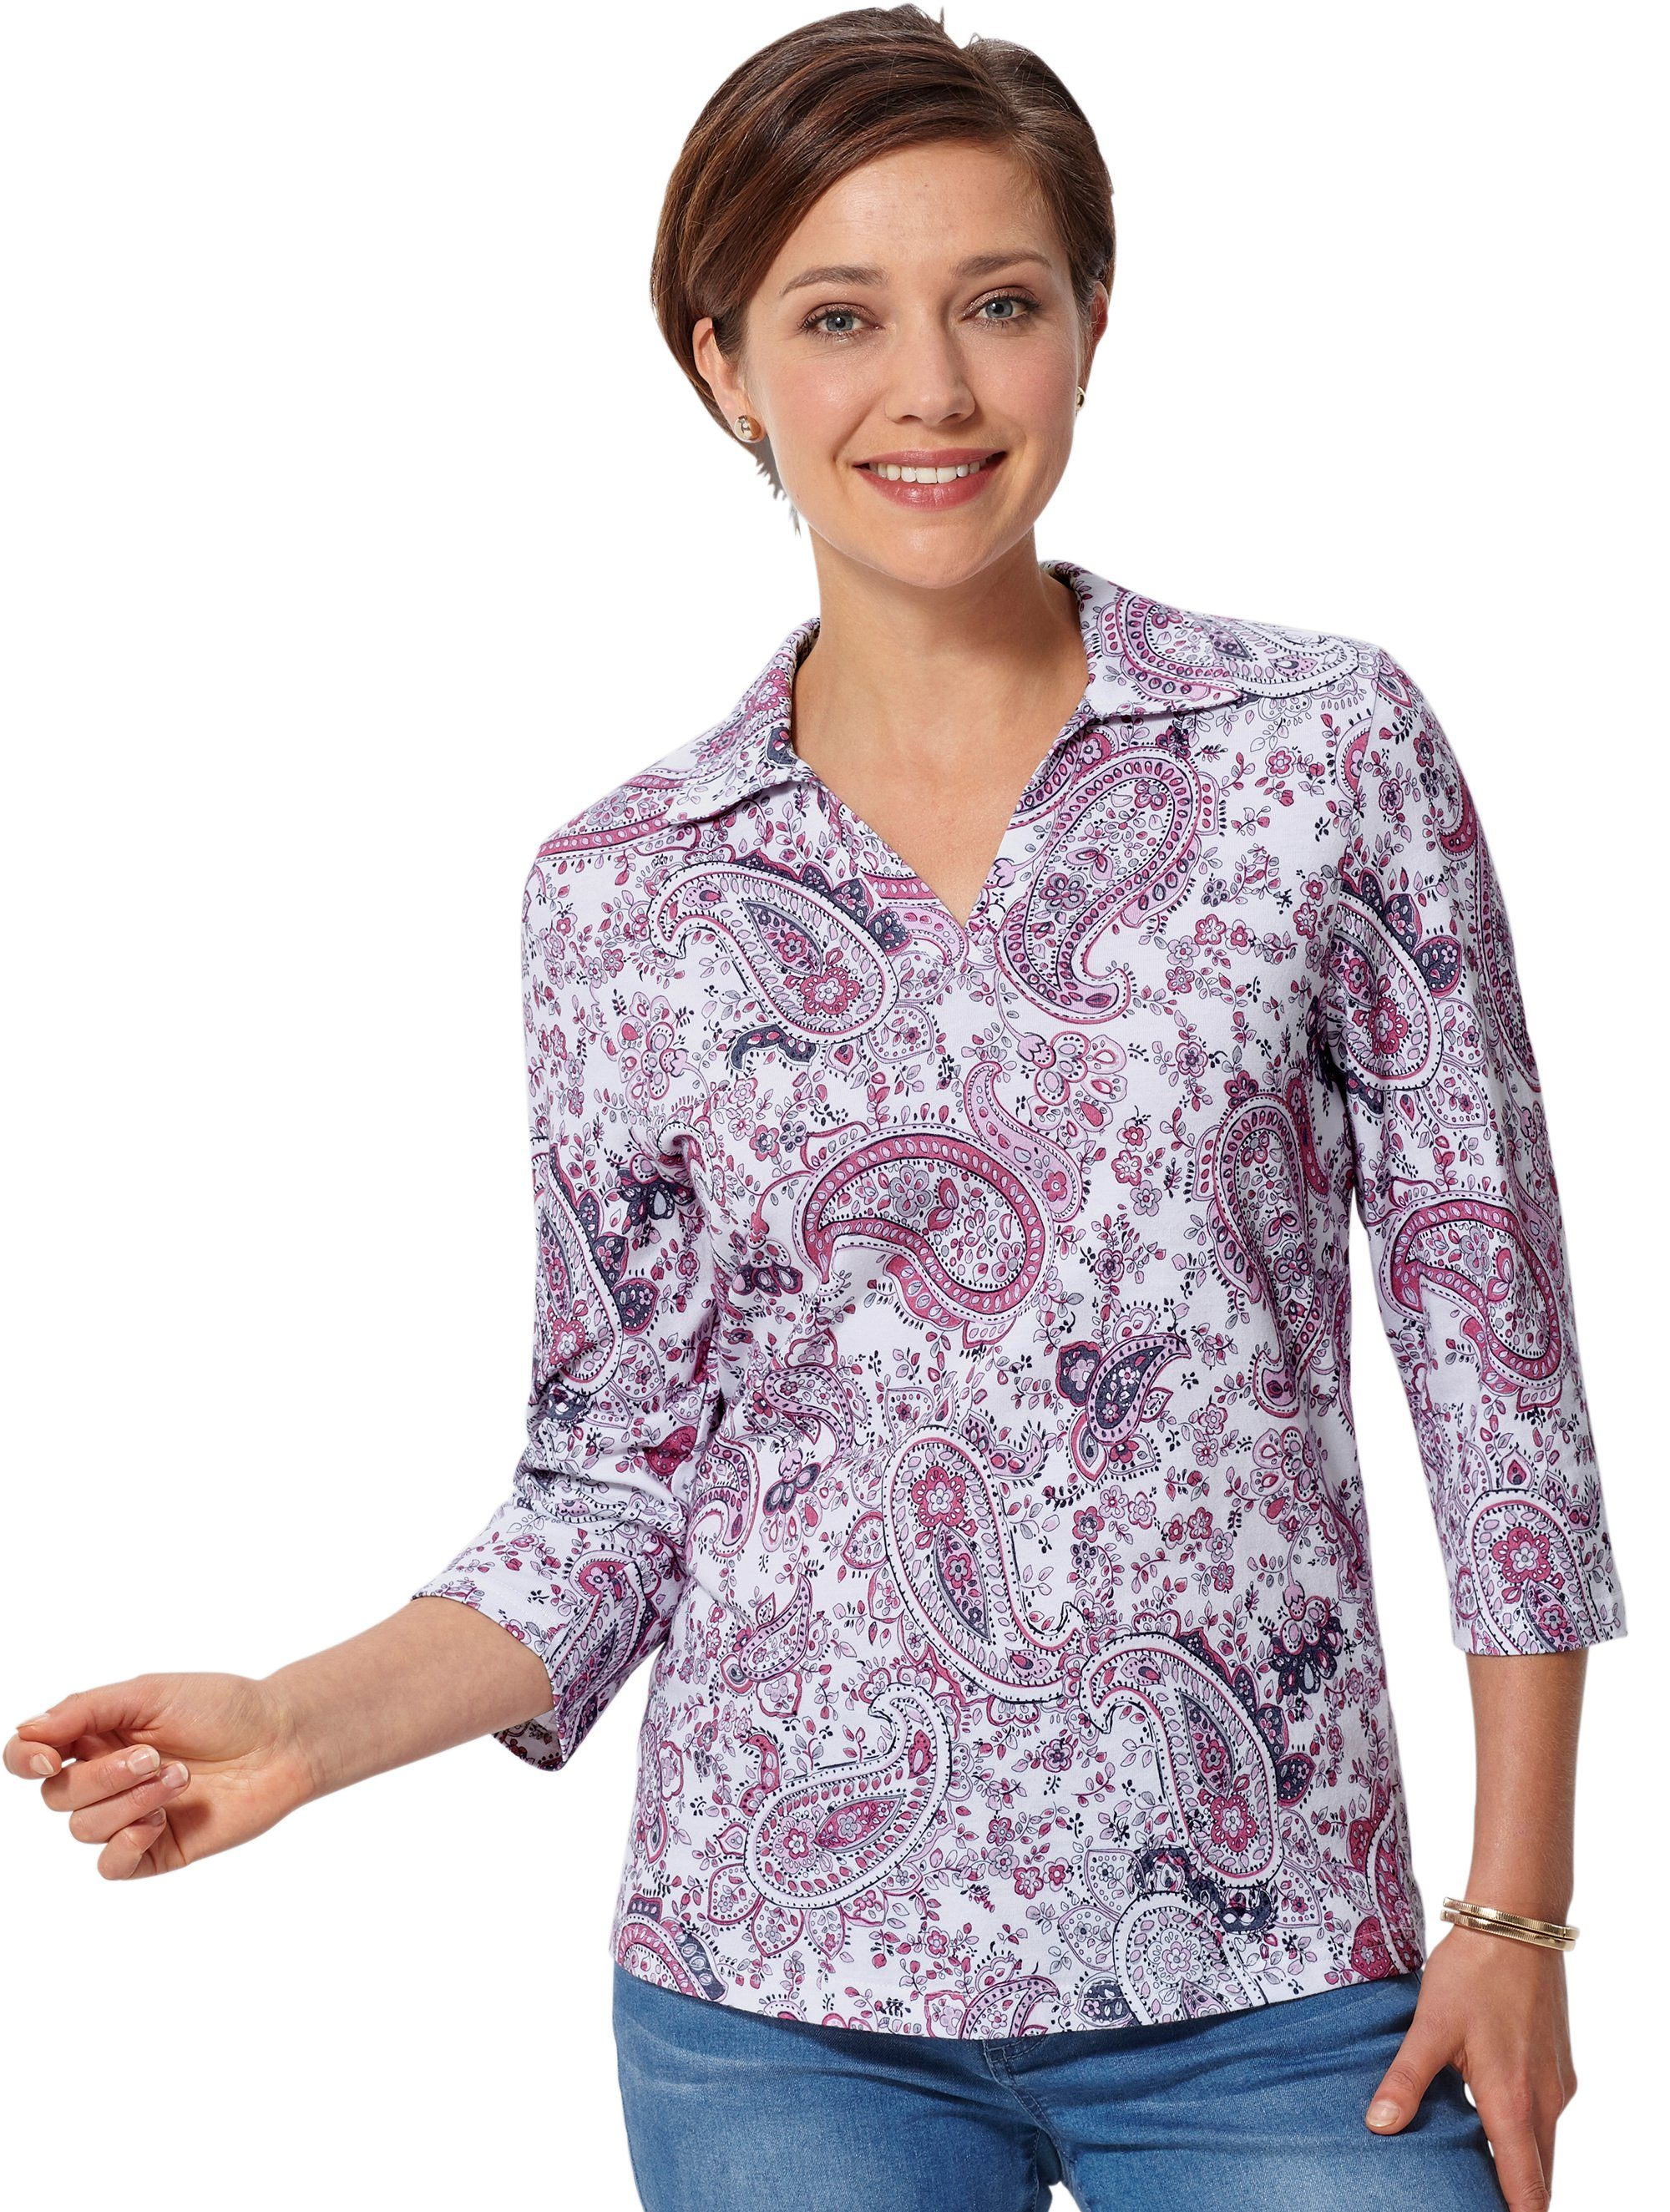 Classic Basics Poloshirt in trageangenehmer Single-Jersey-Qualitä